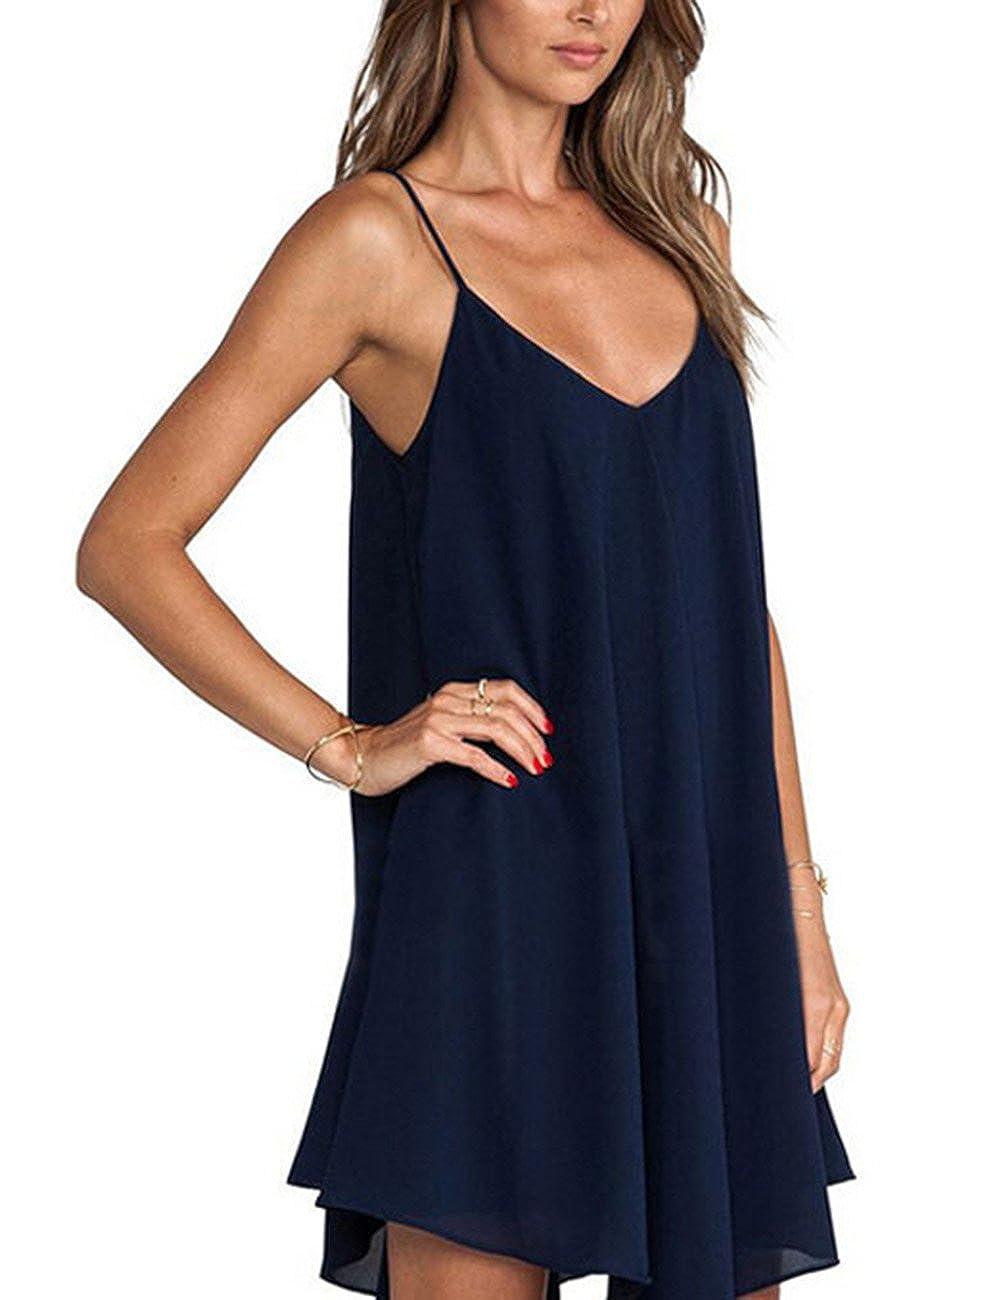 Women Sleeveless Backless Deep V Neck Irregular Hem Sling Lingerie Dress Nightwear PINSHANG